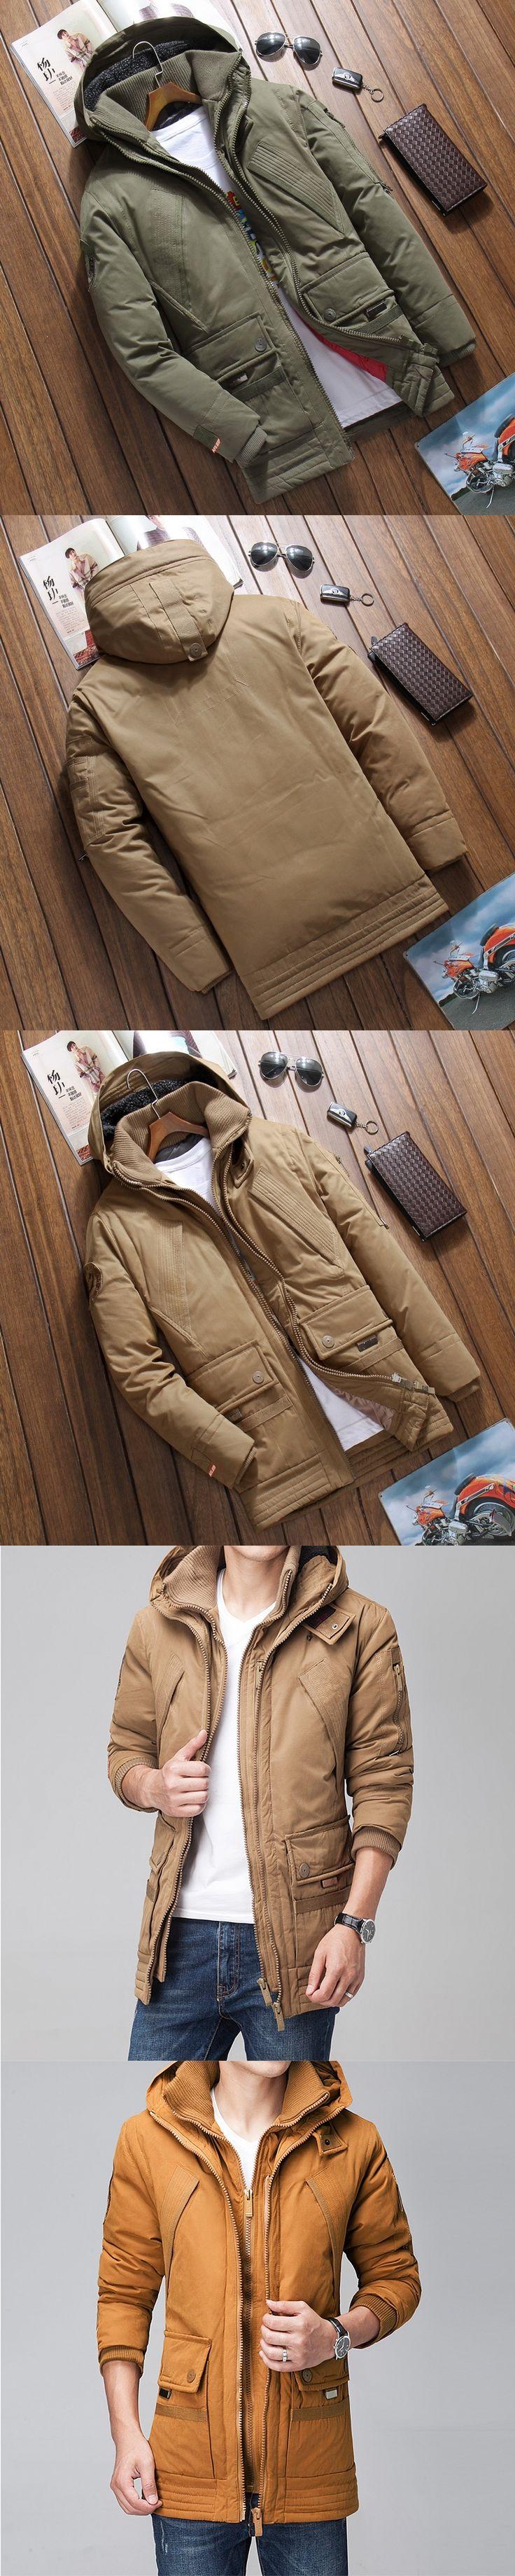 2017 winter Parka warm down jacket men thick long Cotton jacket male hooded  Parka Hombre  Casacos Jaqueta Masculina Inverno